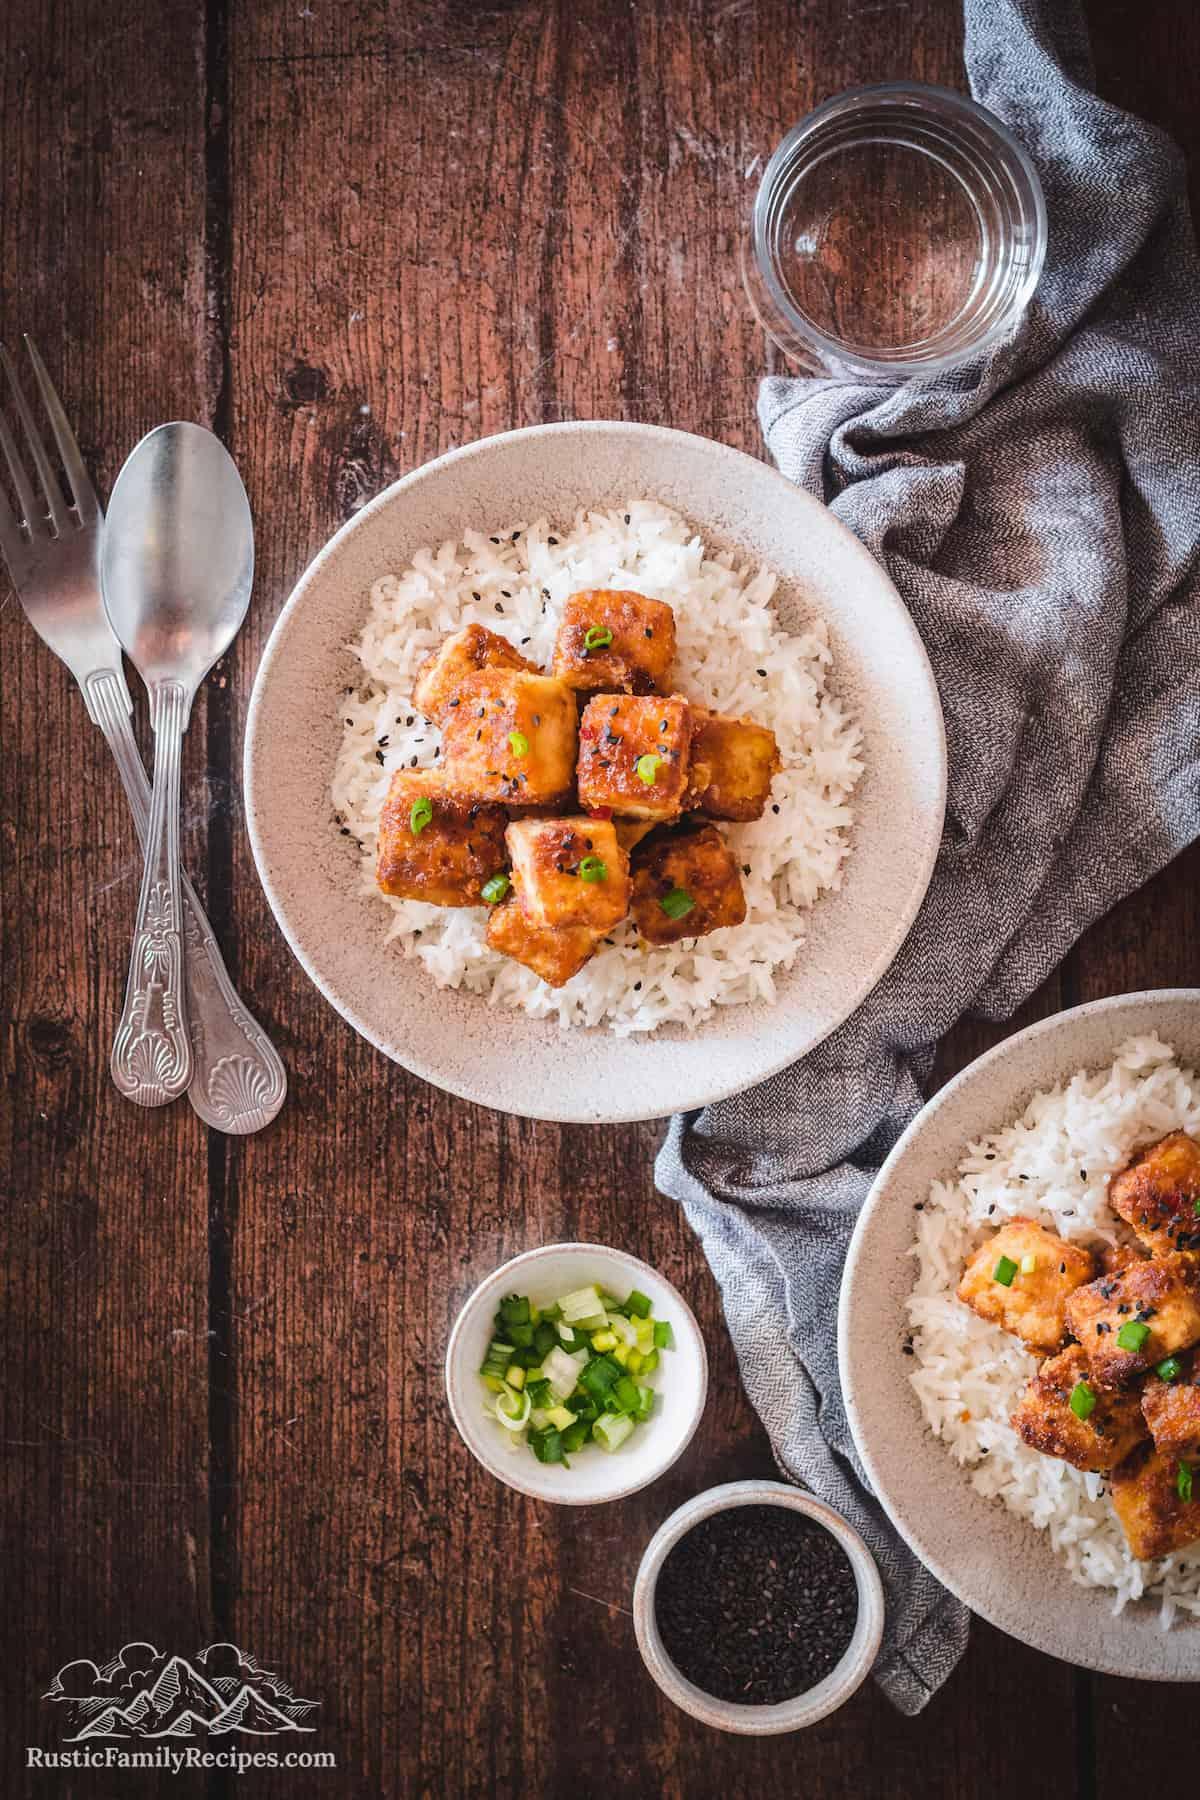 Overhead shot of Orange Tofu recipe in white bowl with rice